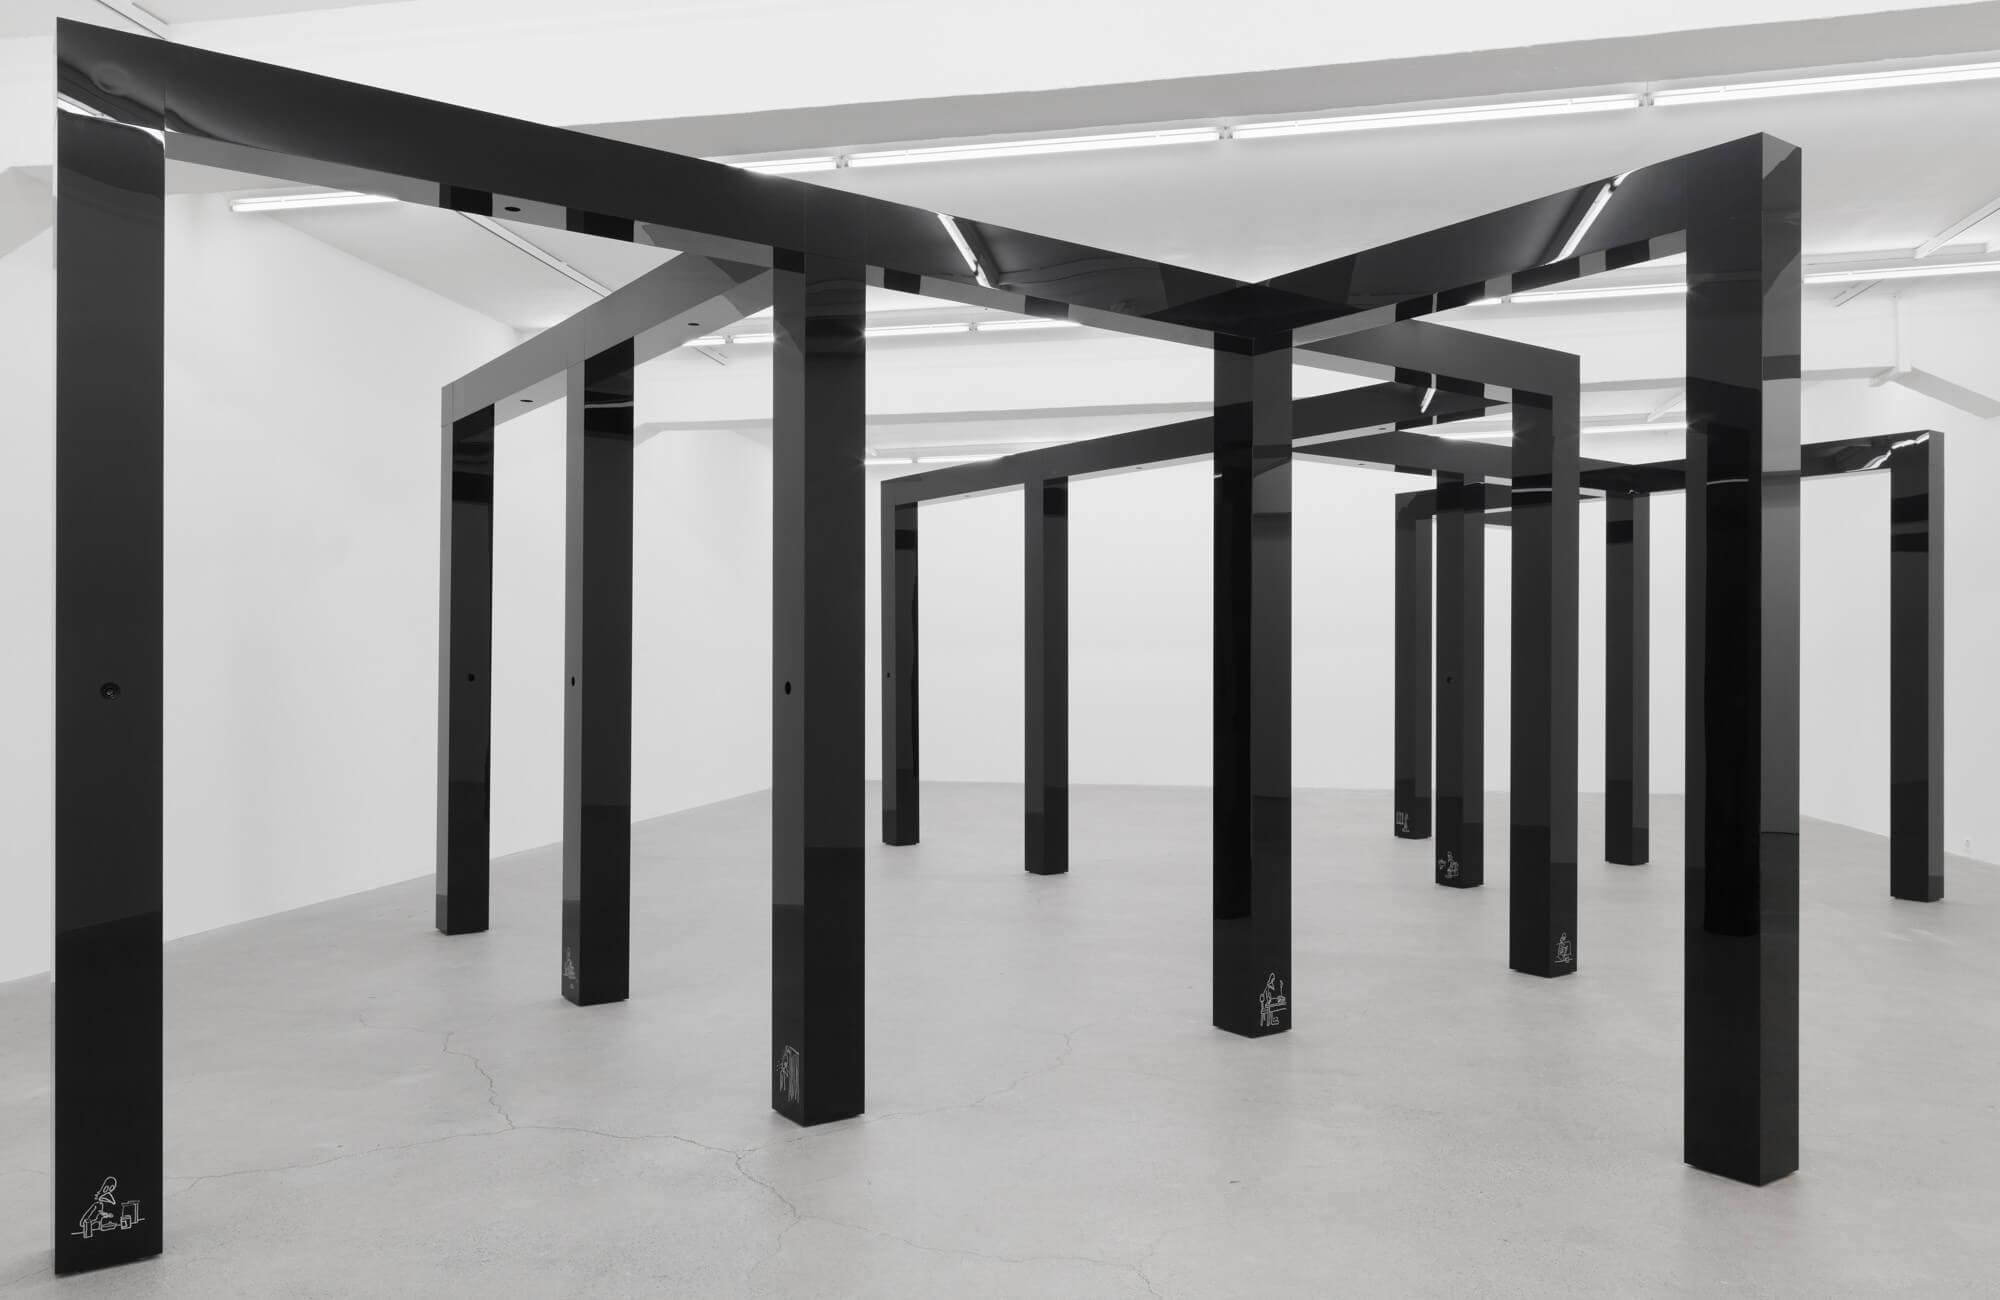 all those doors | UGO RONDINONE